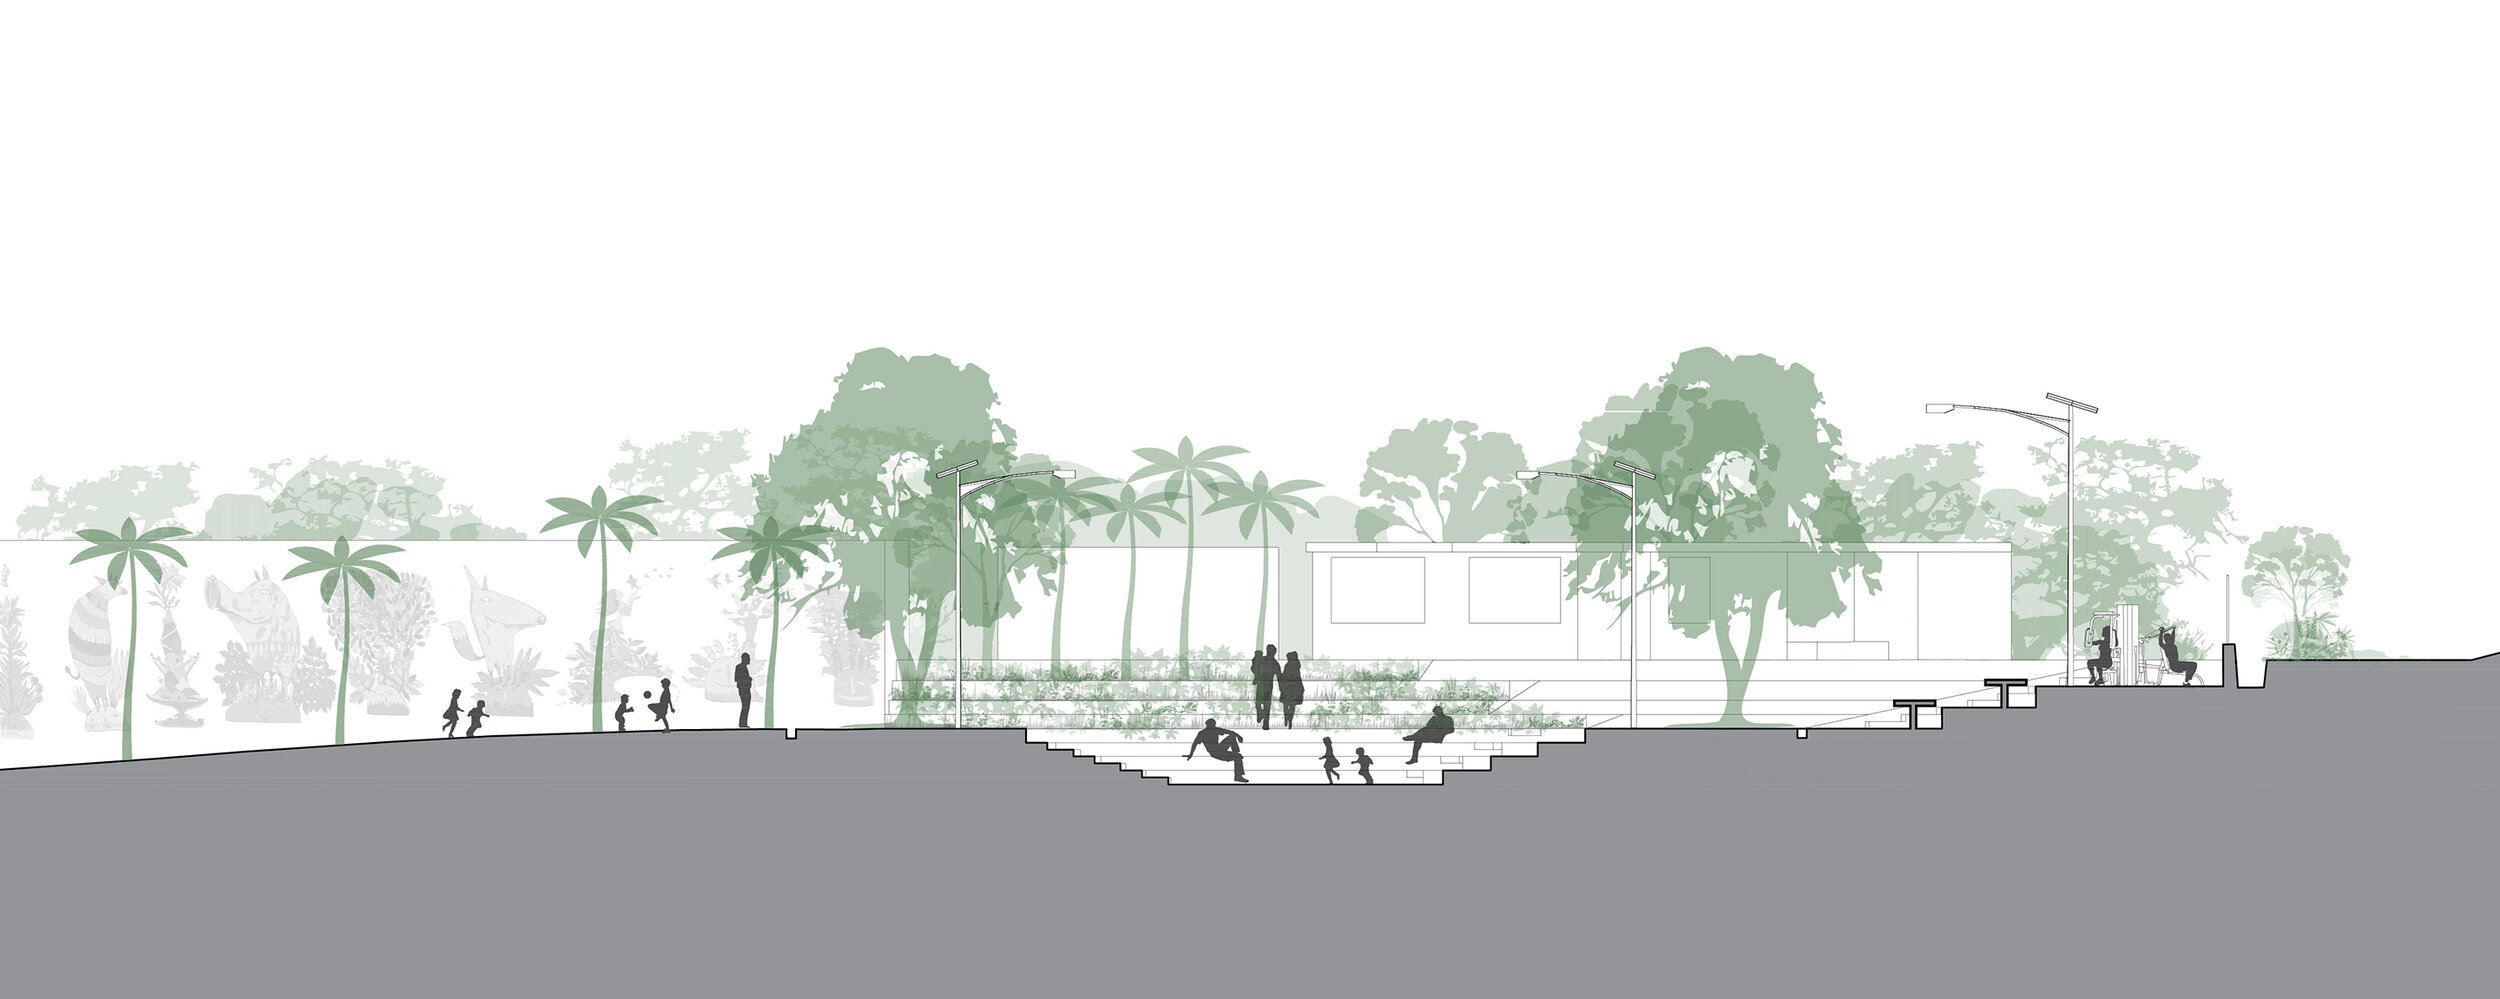 a public space in an informal